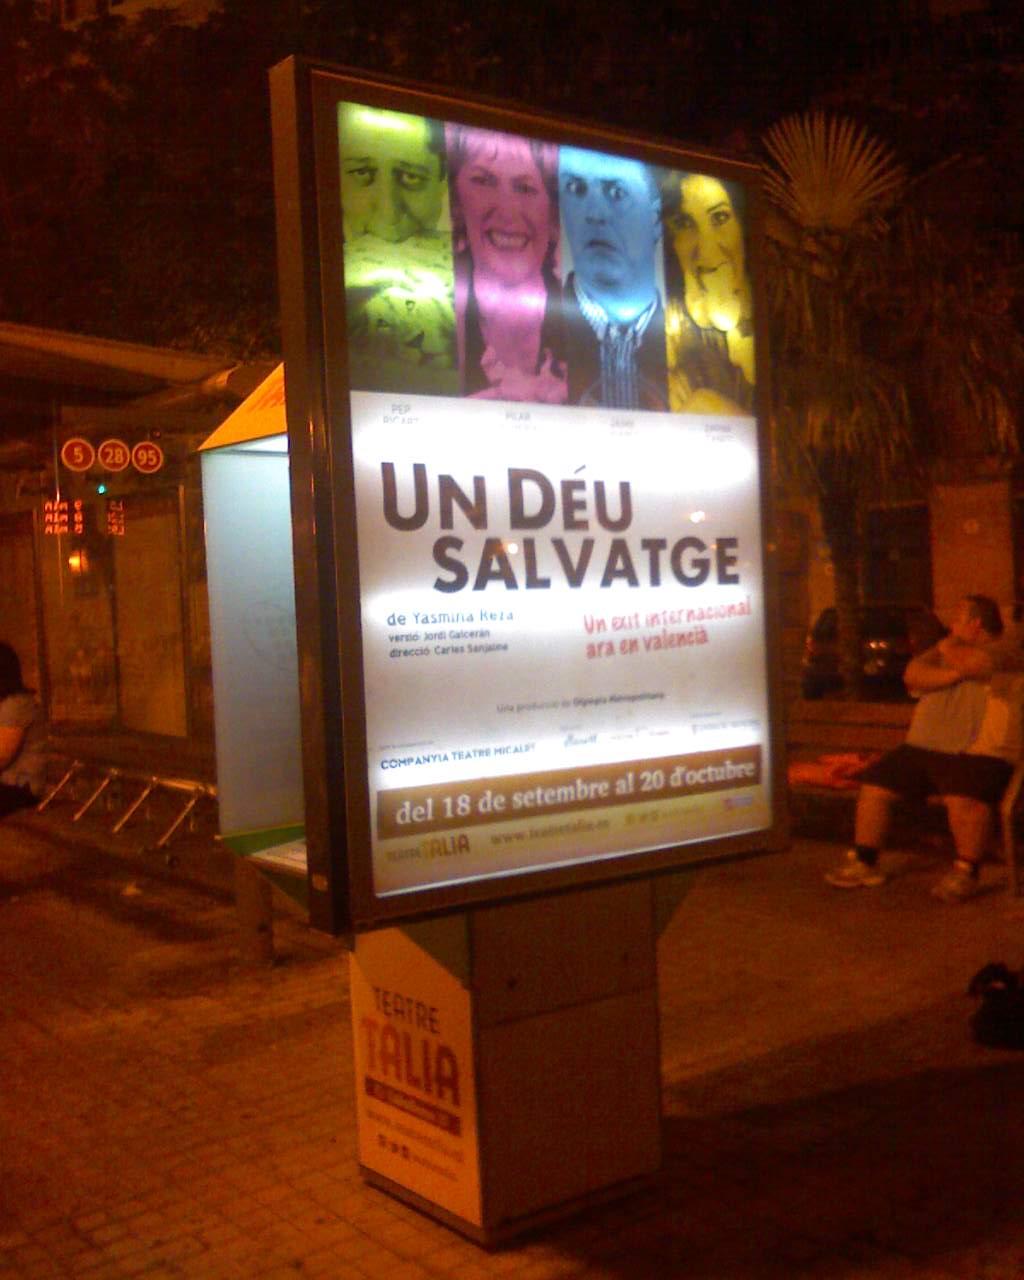 UN DÉU SALVATGE – Teatre Talía